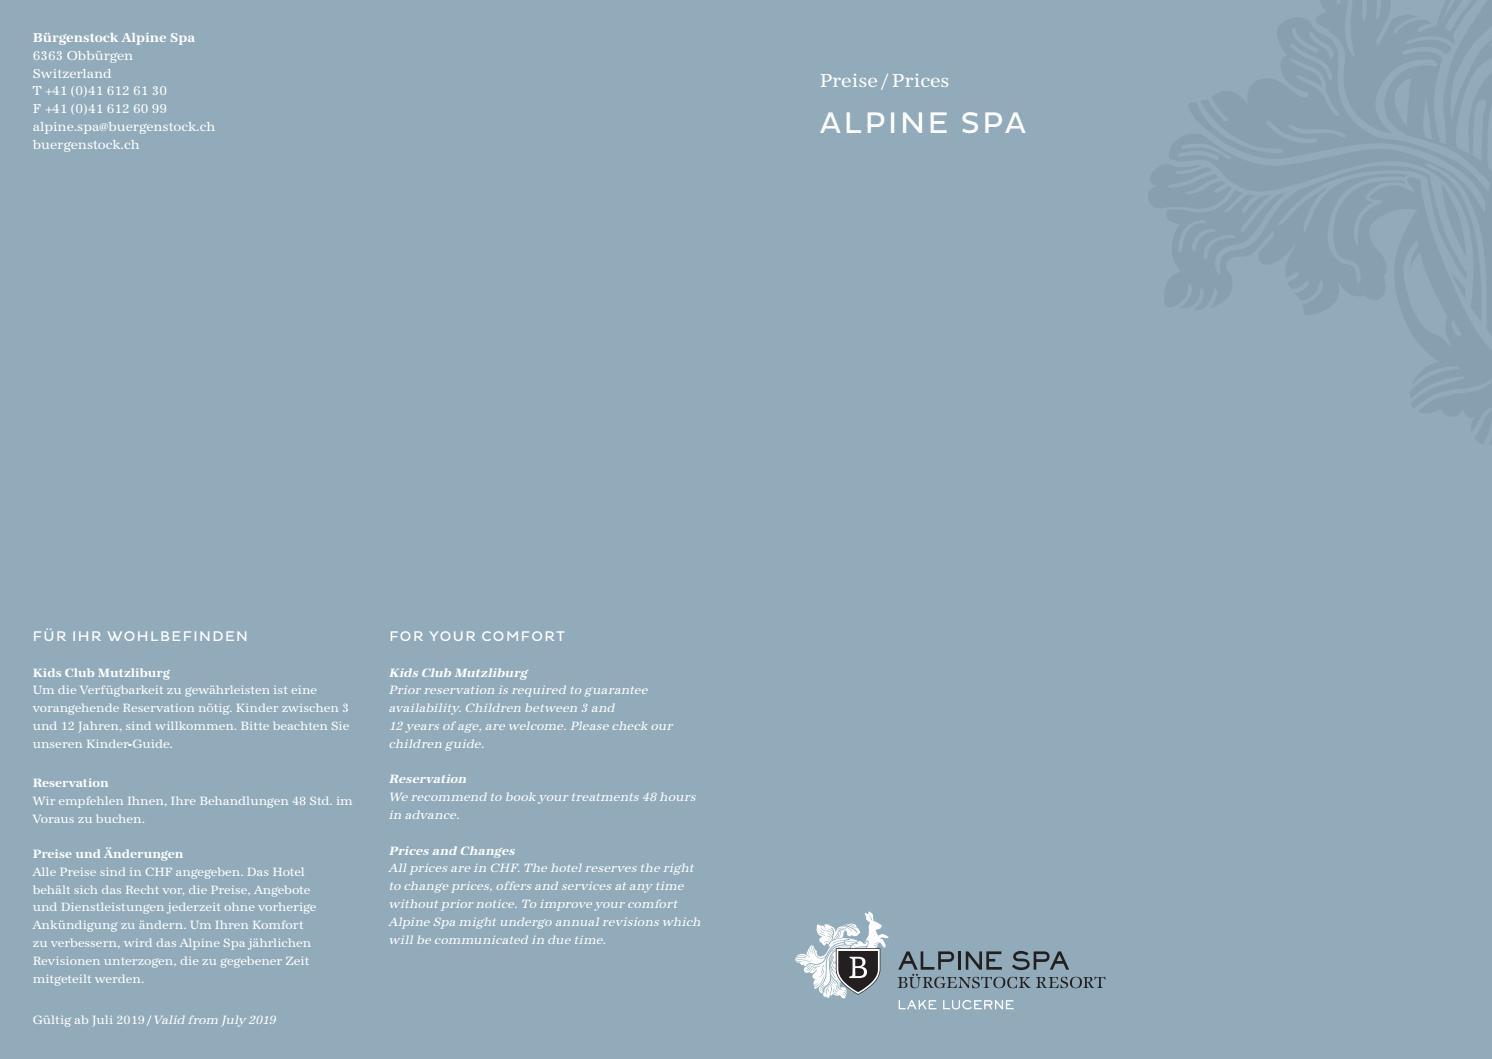 565eb65aaa Preisliste Alpine Spa by The Bürgenstock Selection - issuu